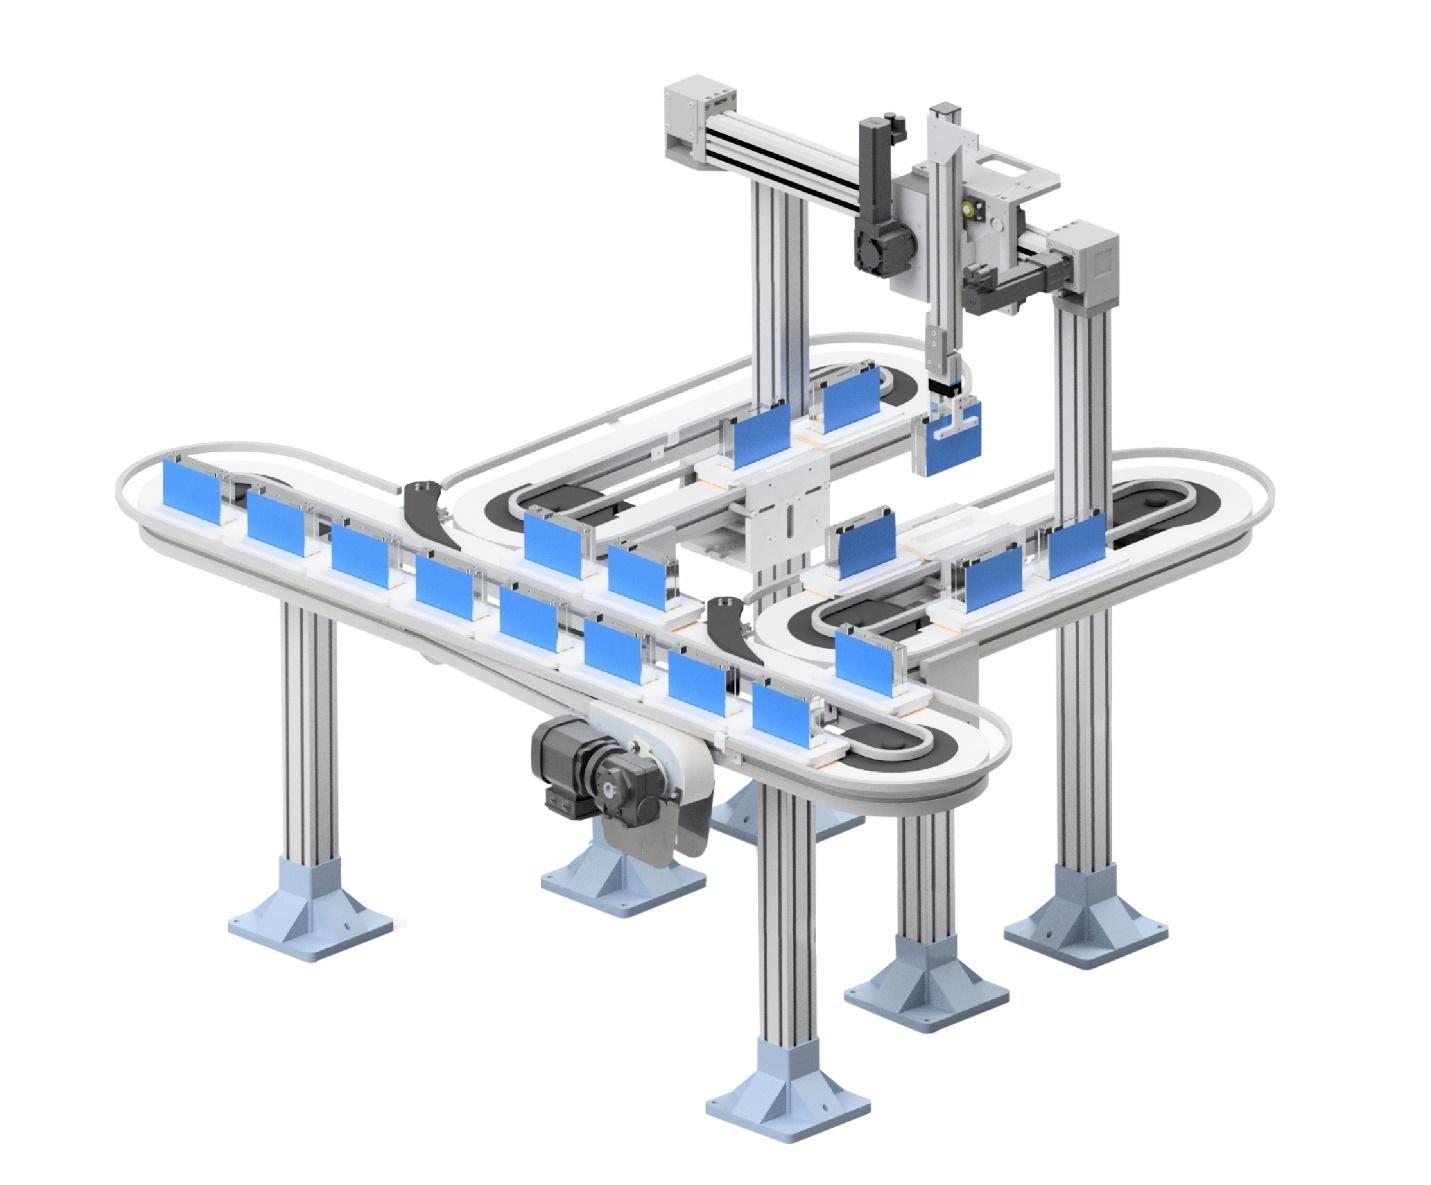 mk North America Introduces VersaFlex P08 Pallet-Handling Conveyor System